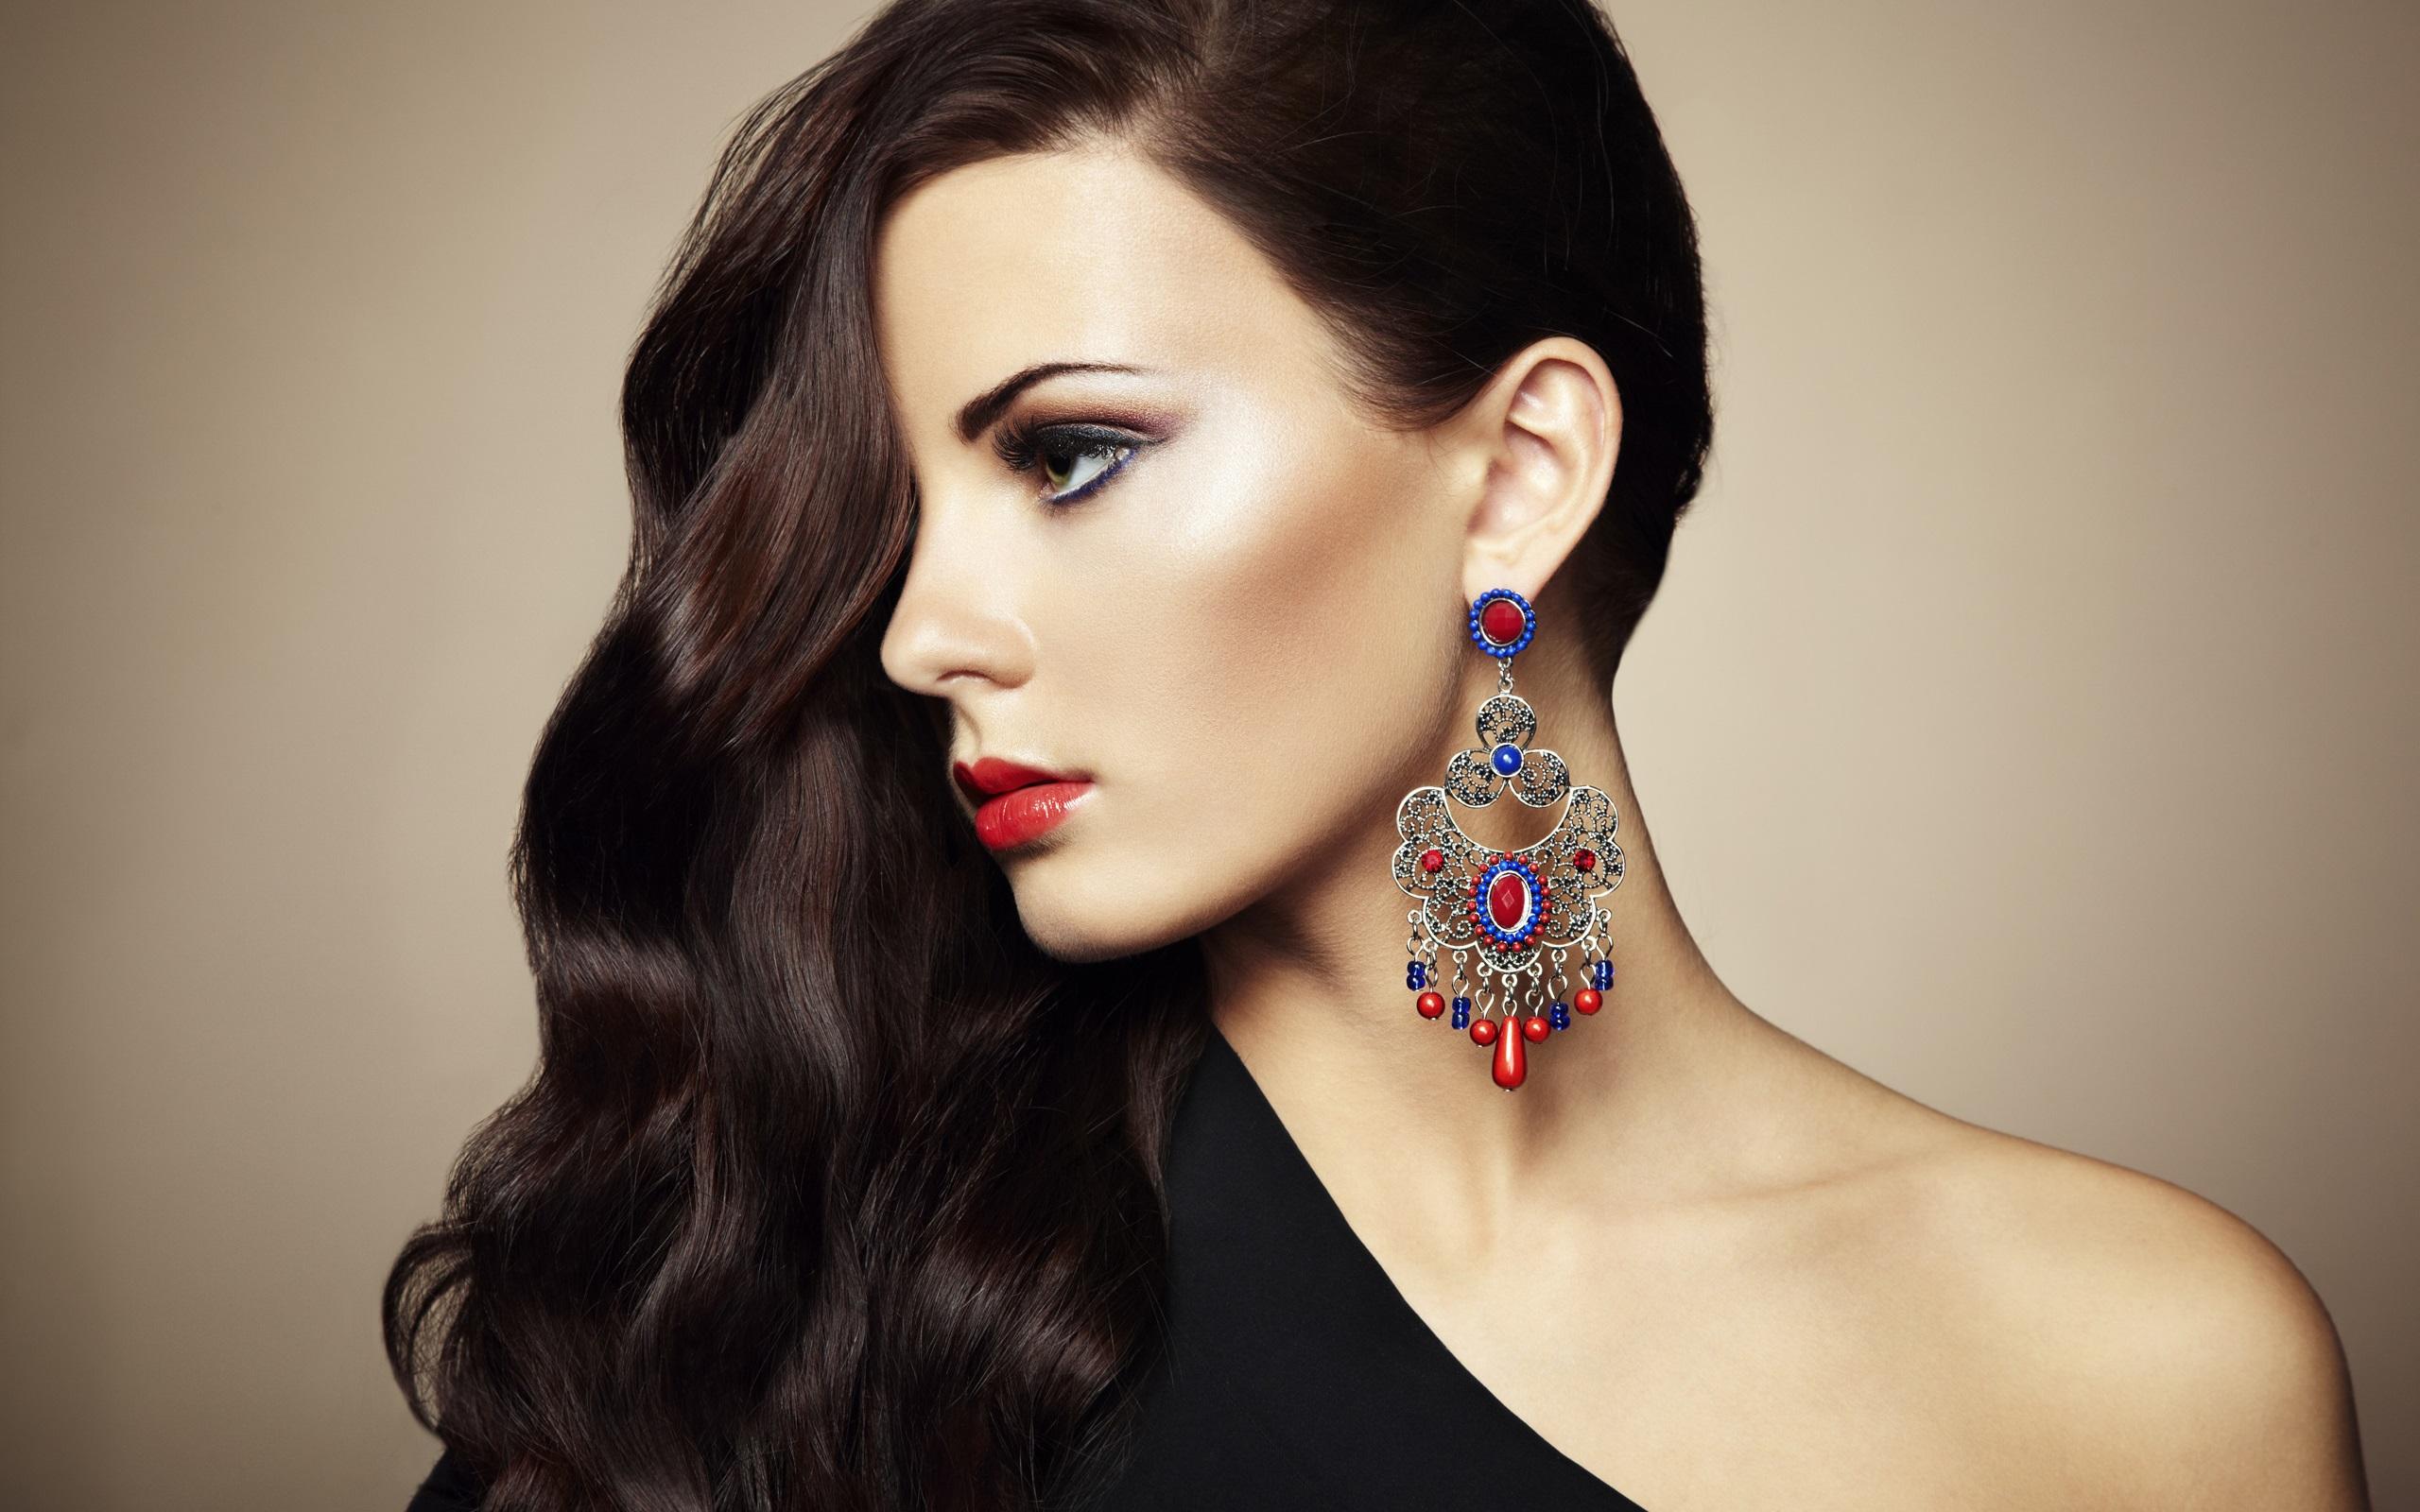 https://ru.best-wallpaper.net/wallpaper/2560x1600/1412/Beautiful-attractive-girl-elegant-long-hair_2560x1600.jpg